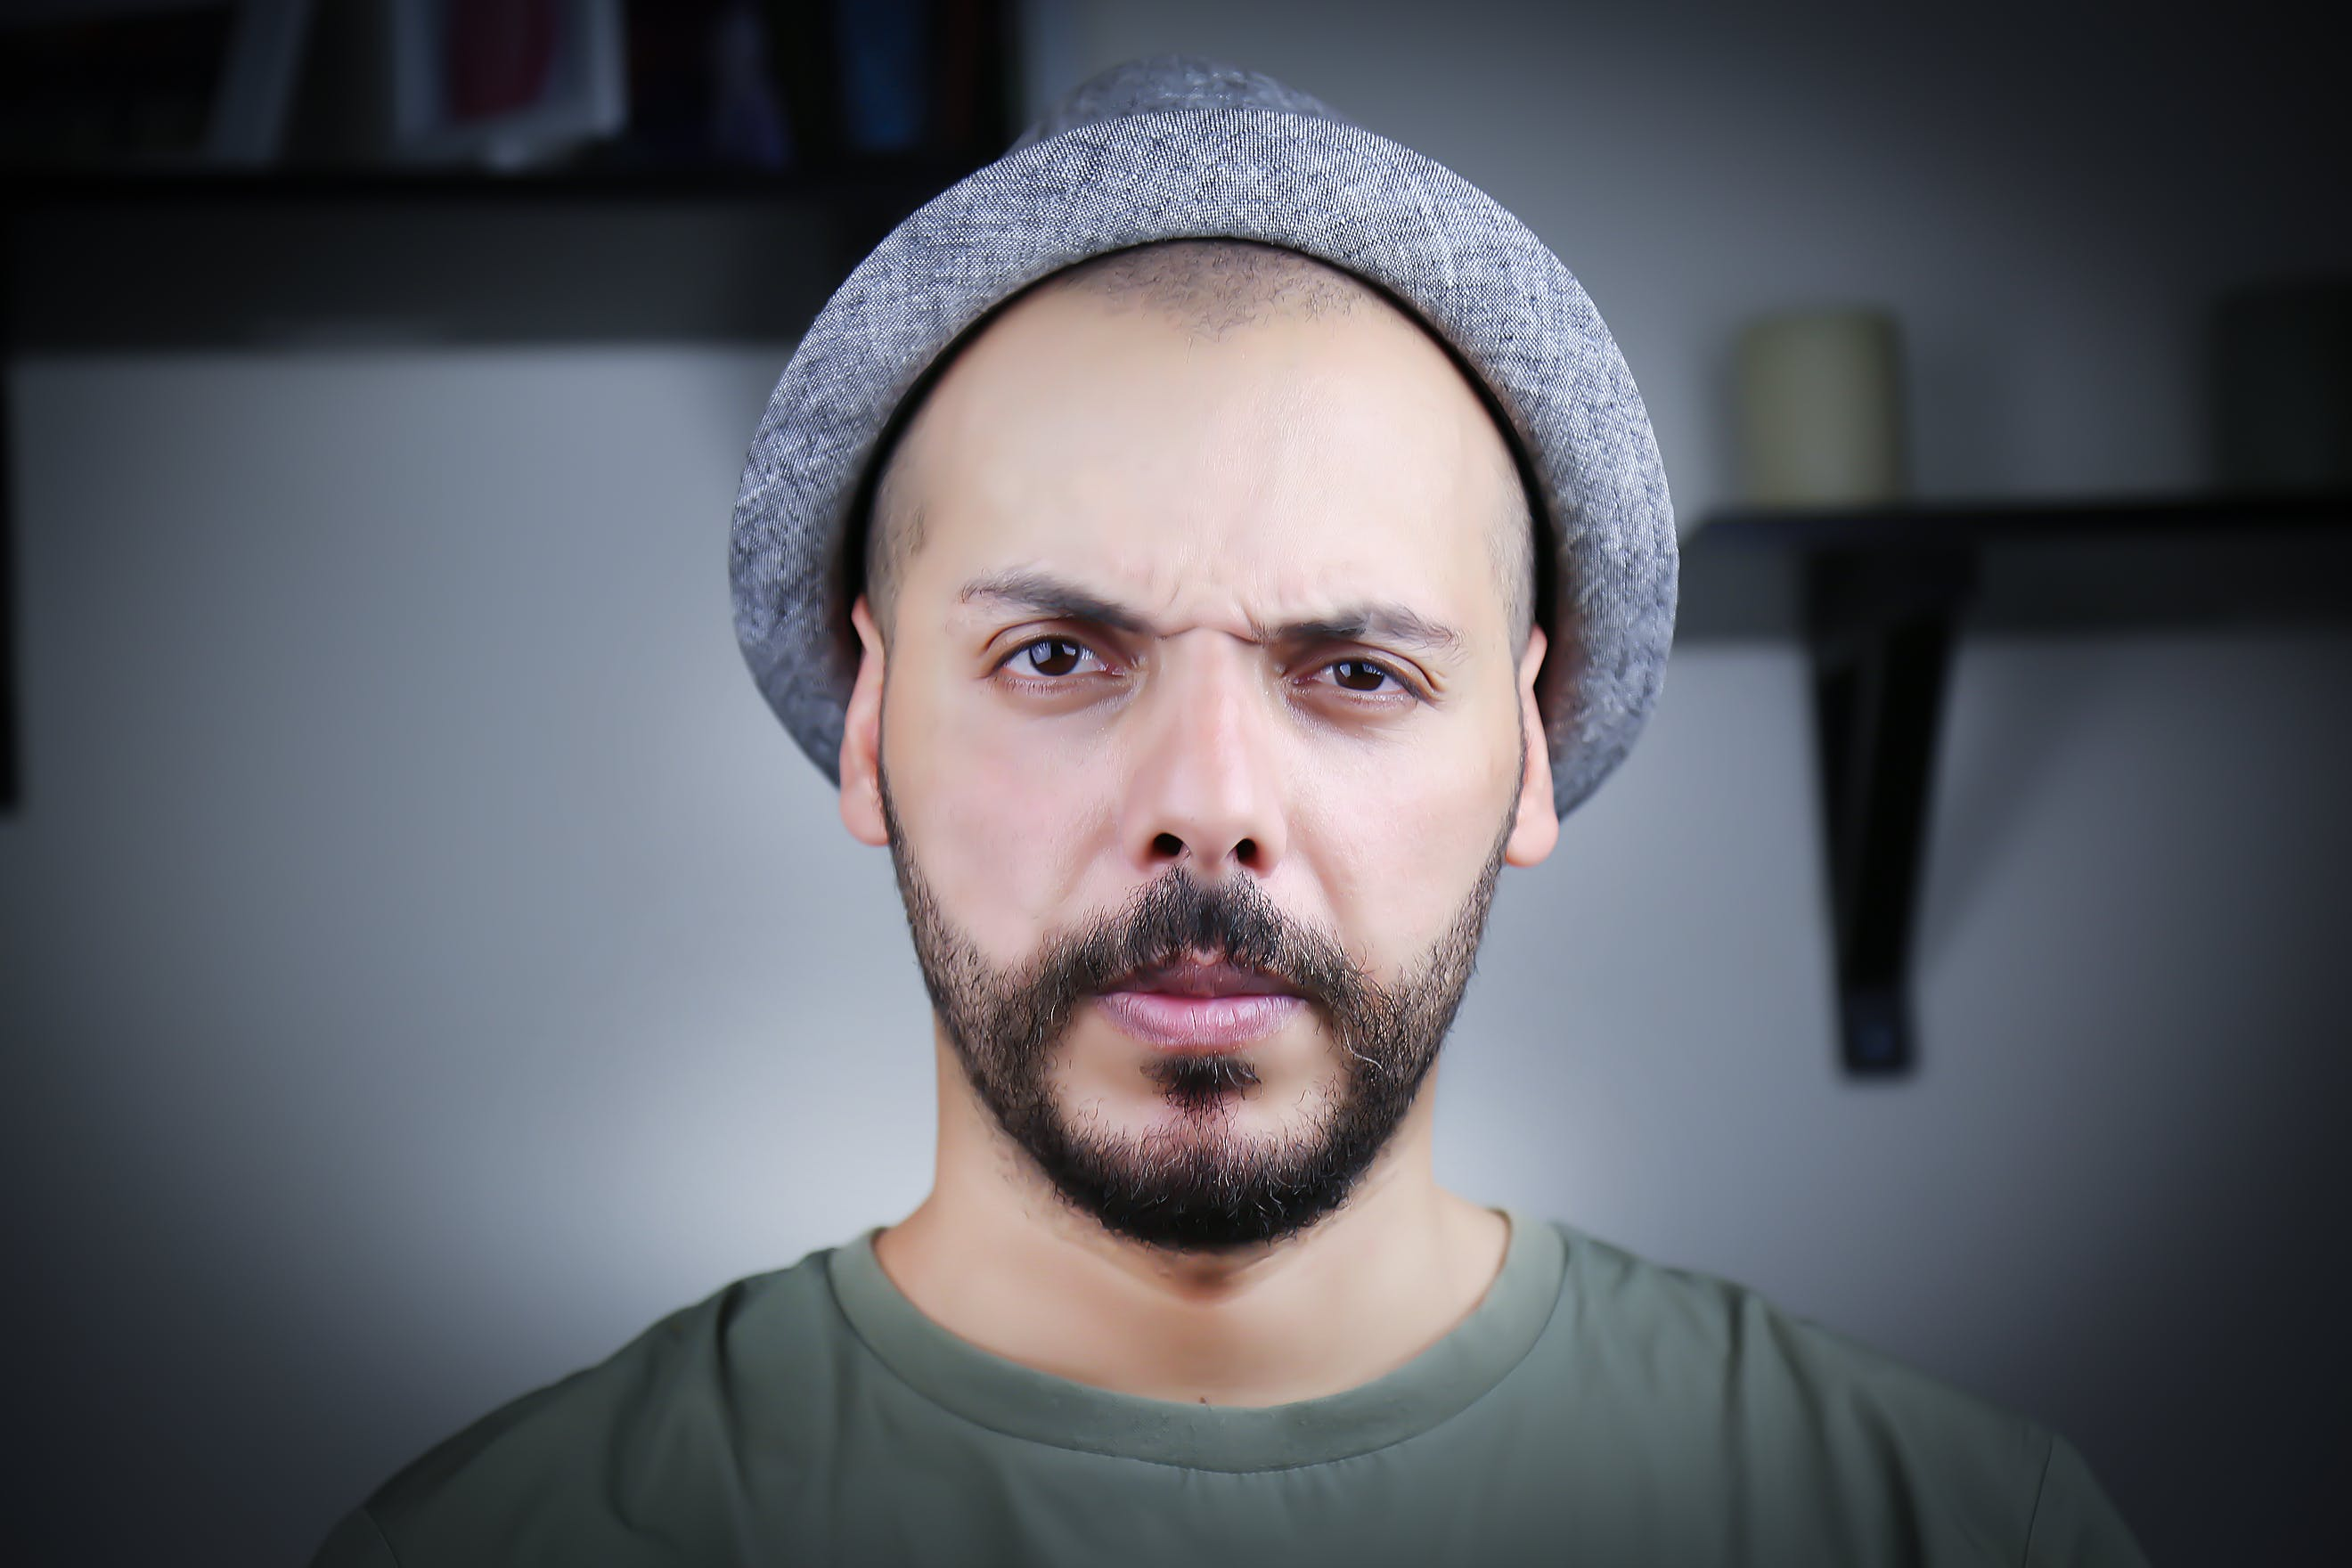 Man Wearing Gray Cap and Crew-neck Top